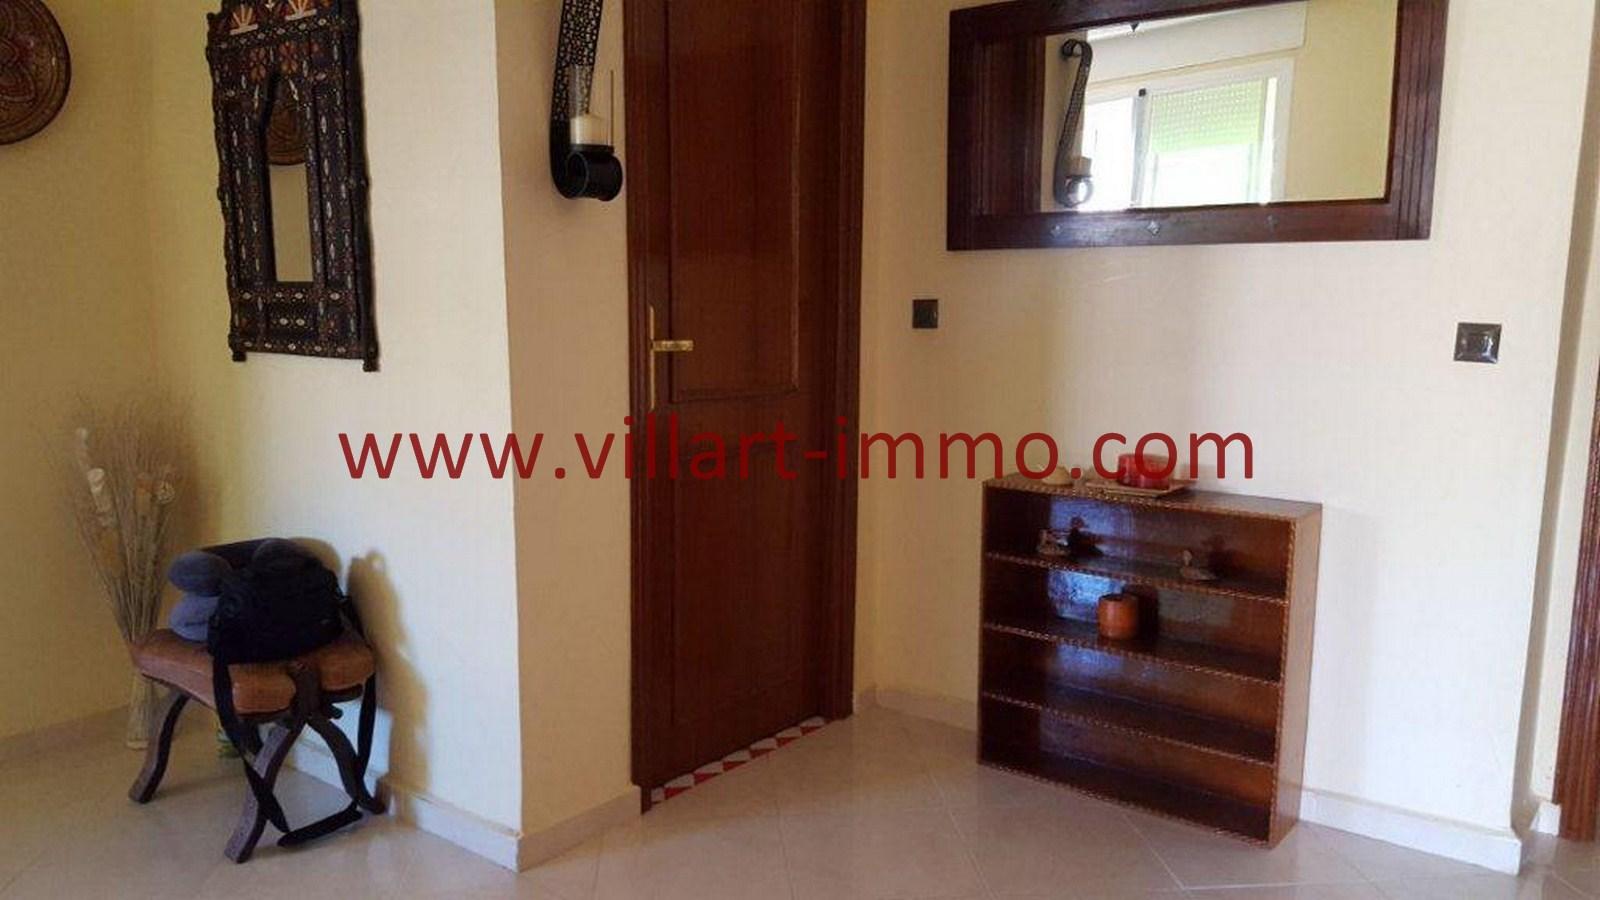 2-Vente-Appartement-Tanger-Entrée -VA509-Villart Immo